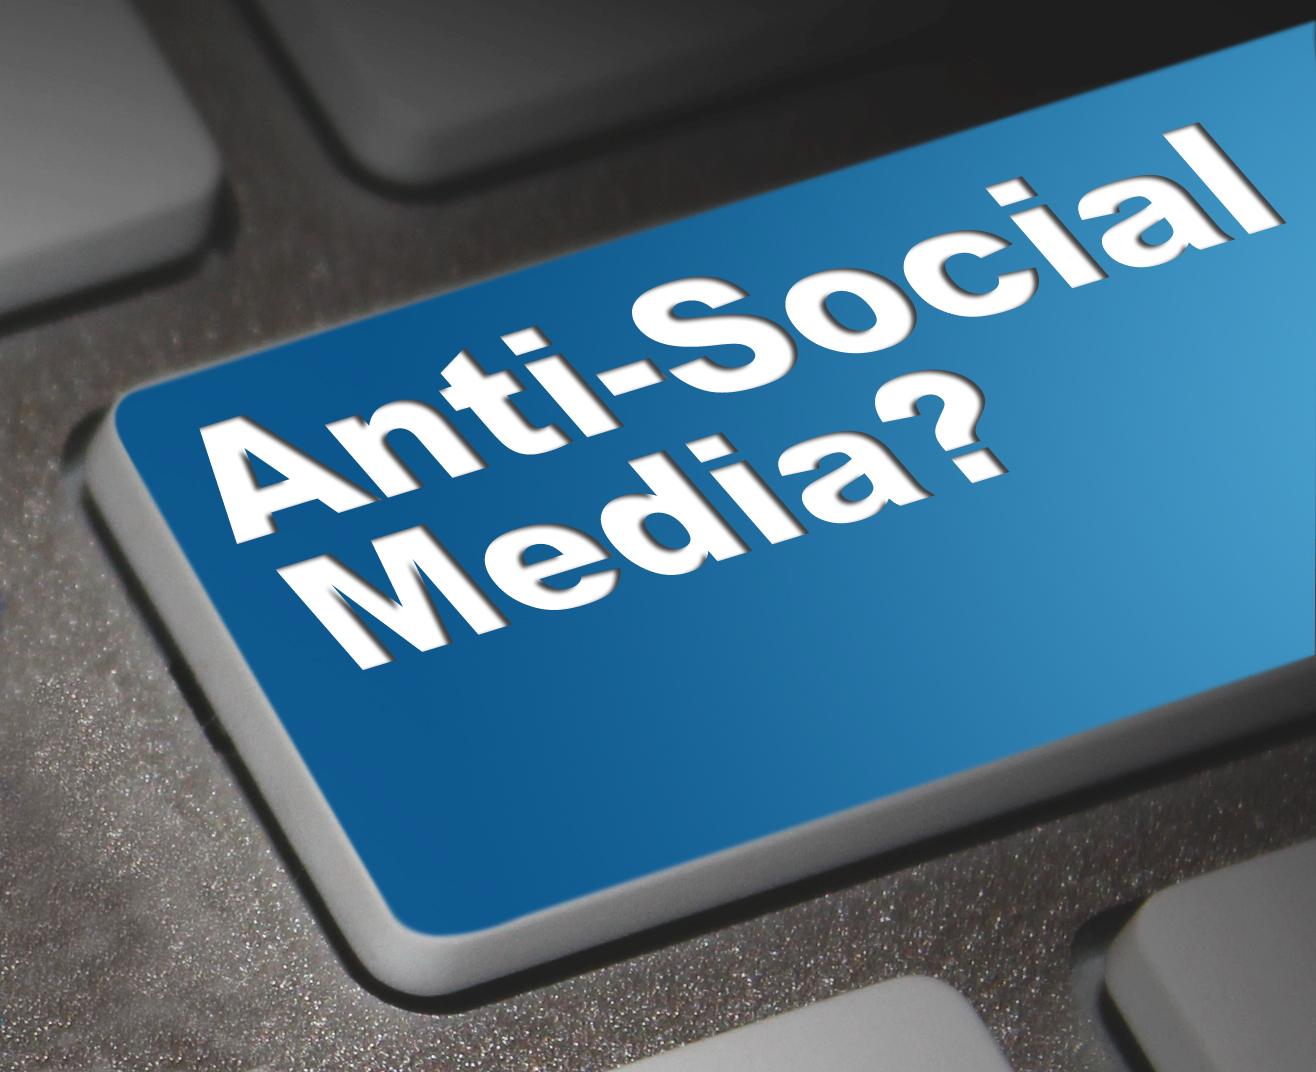 anti-social-media-button1.jpg